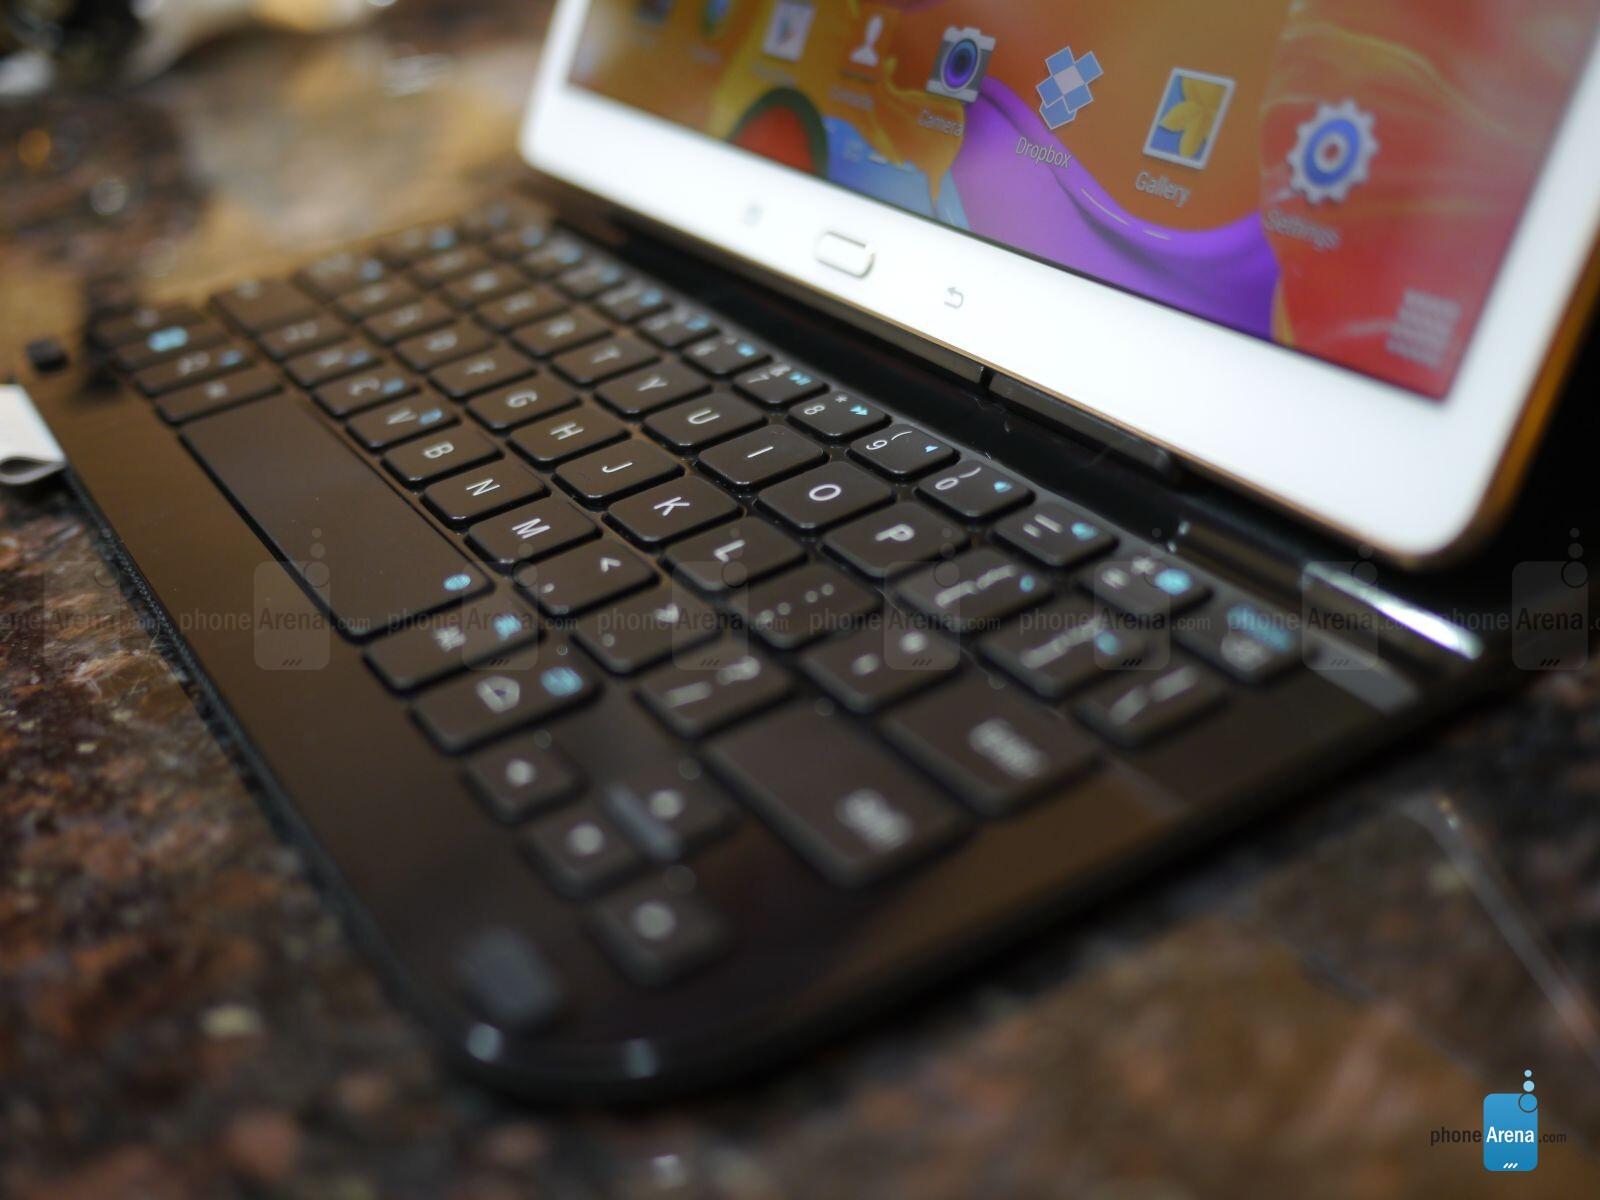 Samsung galaxy s5 keyboard case | Galaxy S8 Keyboard Cover